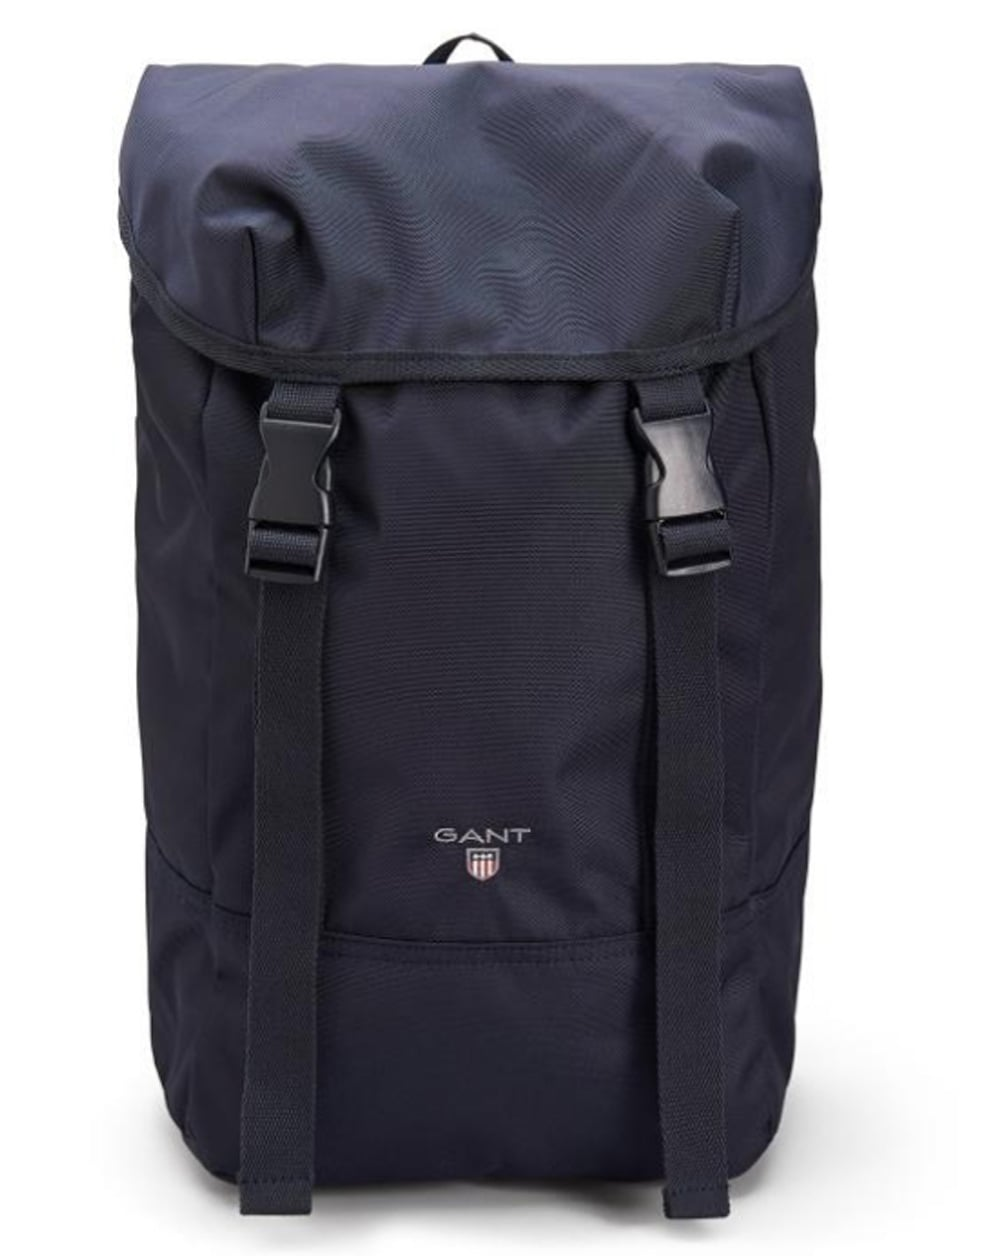 eb80f776598 Gant Original Backpack Marine, Mens, Bag, Rucksack